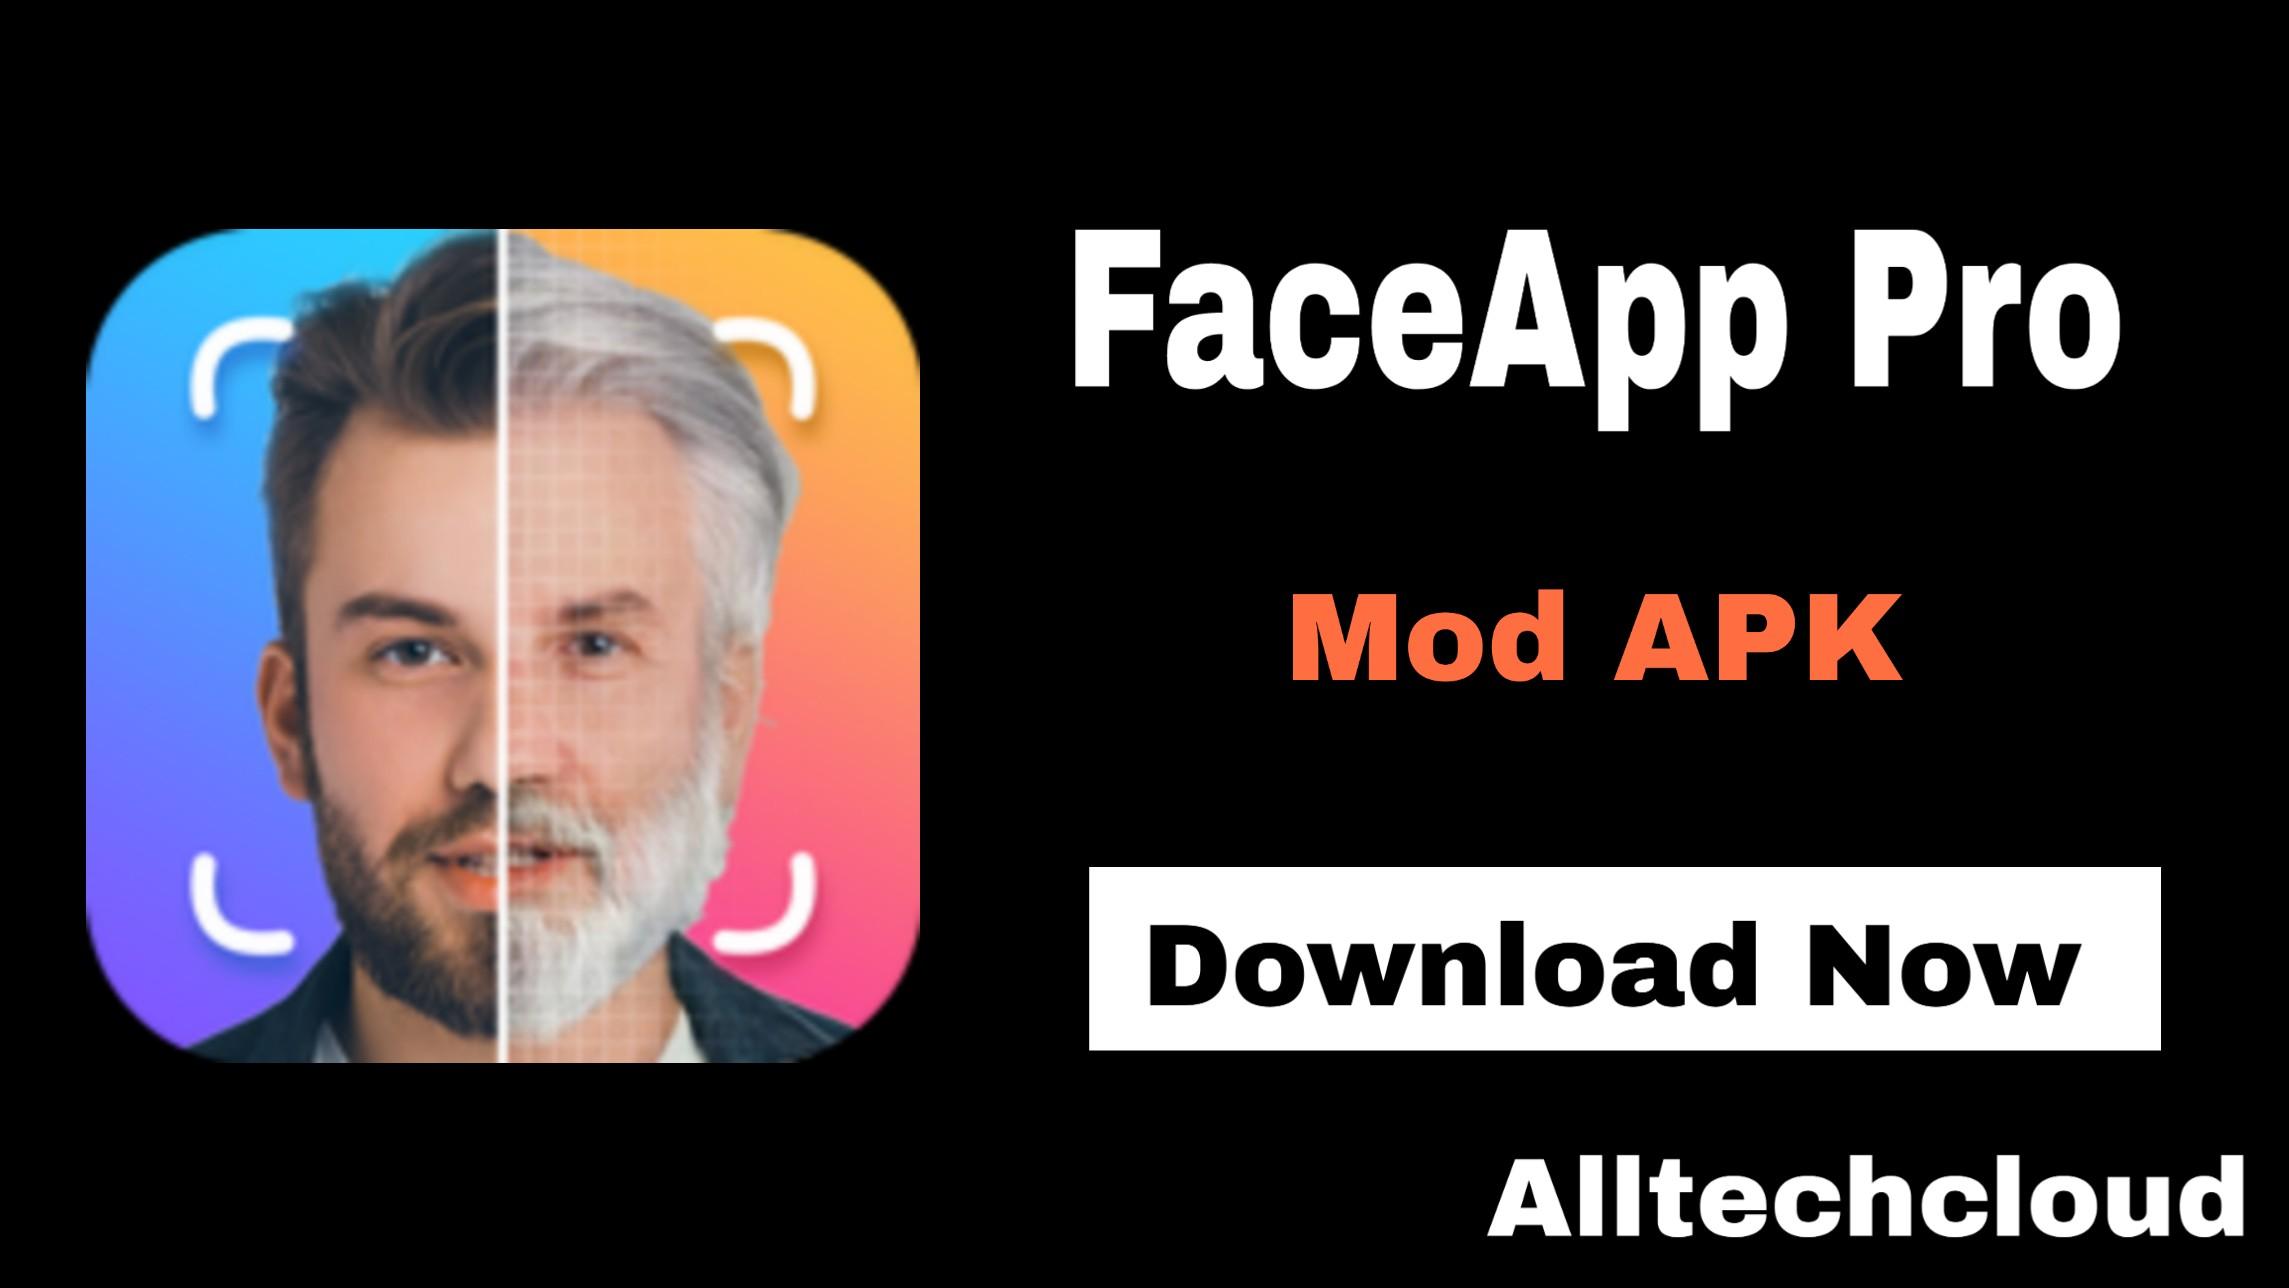 FaceApp Pro Mod APK 4.5.0.10 Free Download [Unlocked/Ads Free] 2021